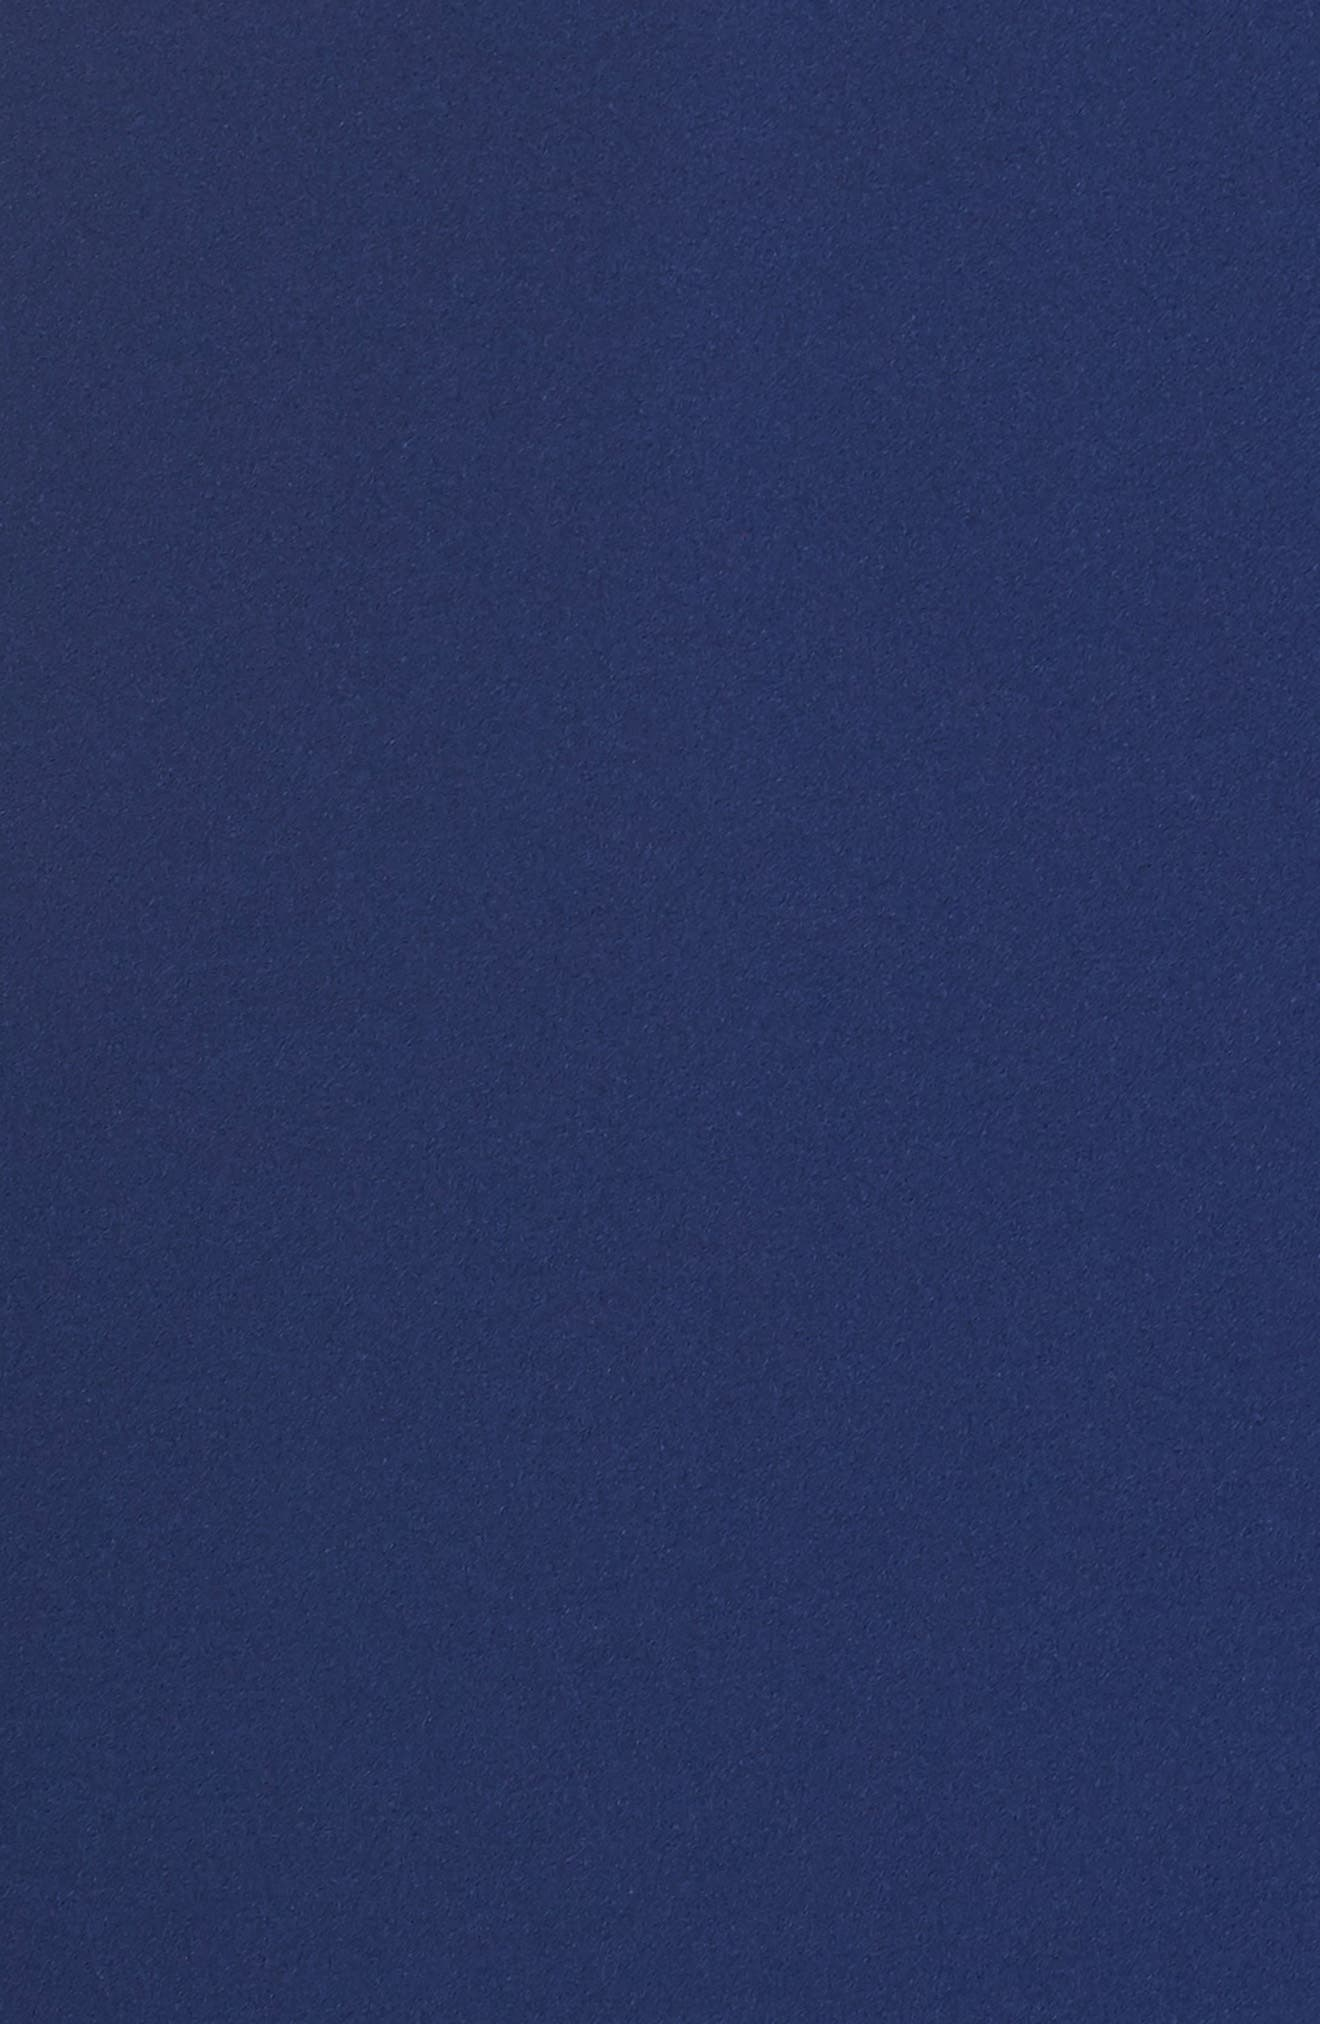 One-Shoulder Jumpsuit,                             Alternate thumbnail 5, color,                             Navy